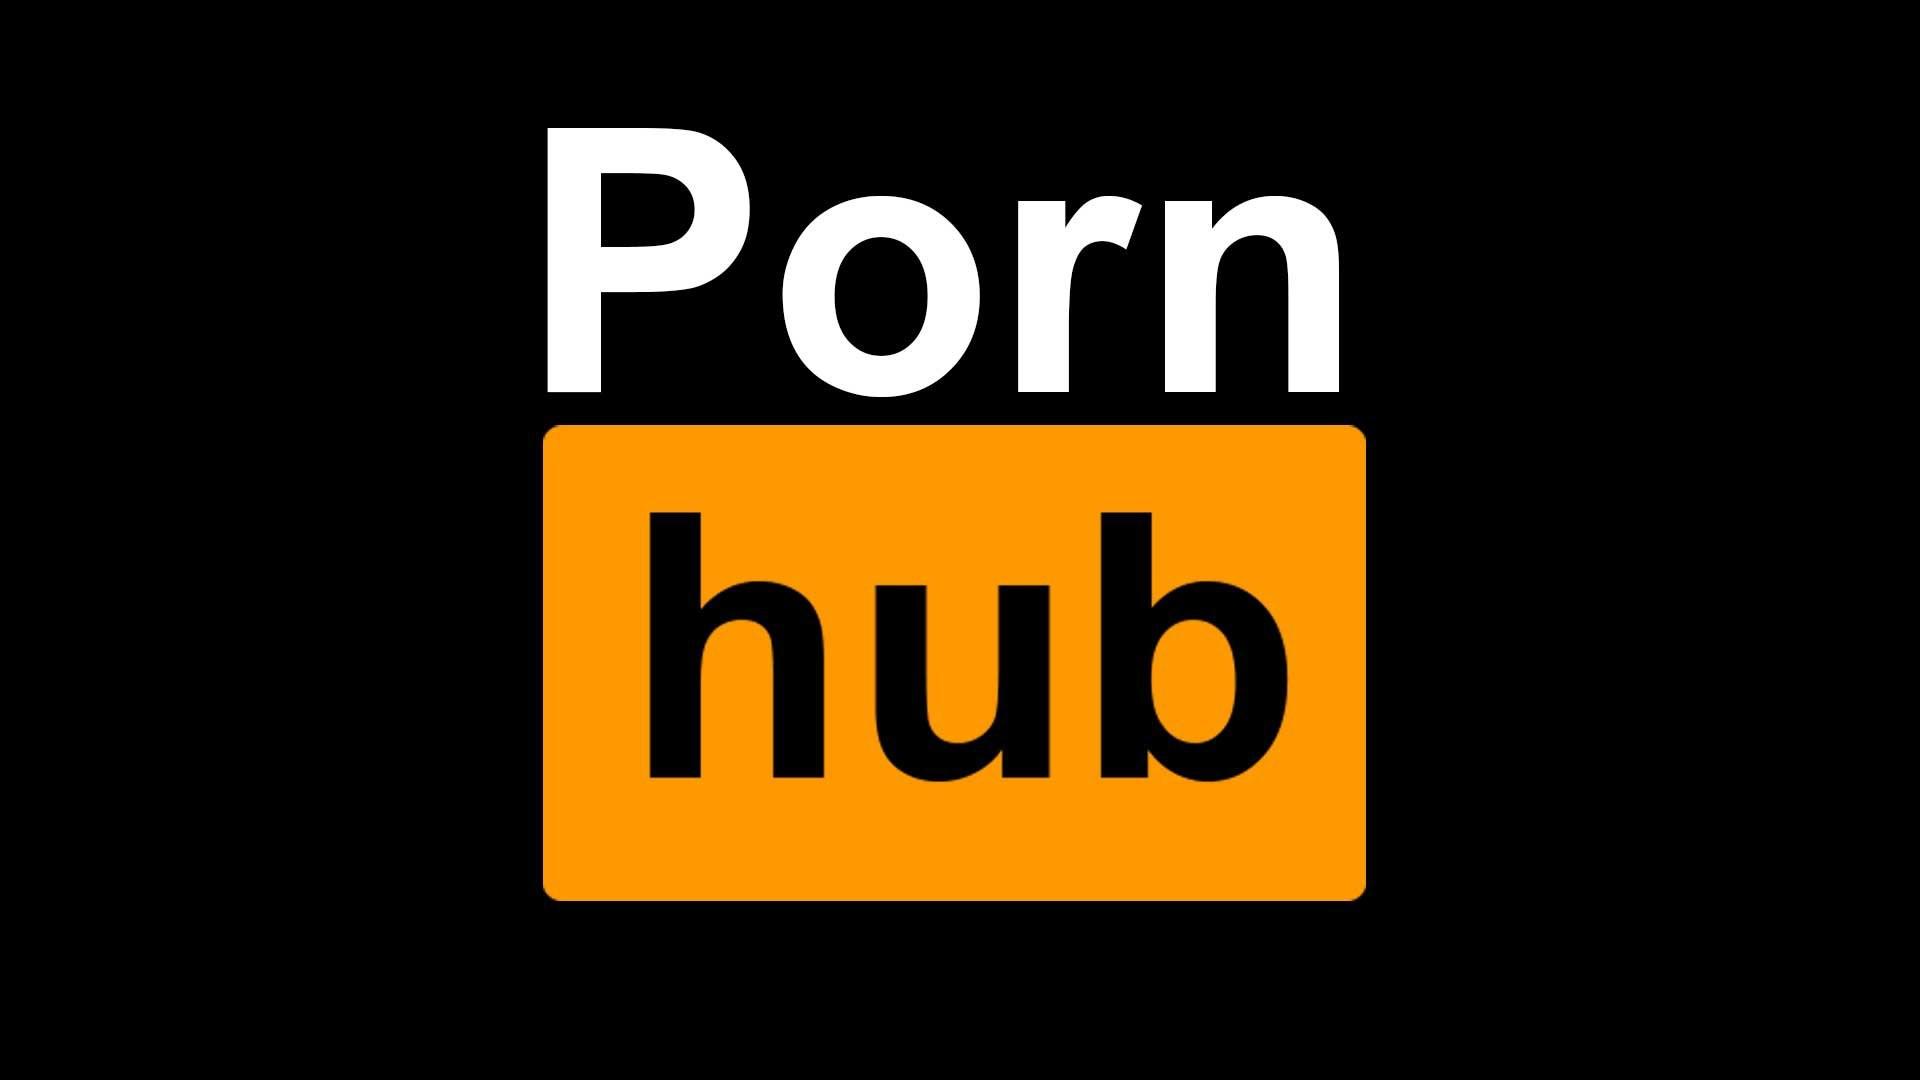 pornhub Voir la vidéo